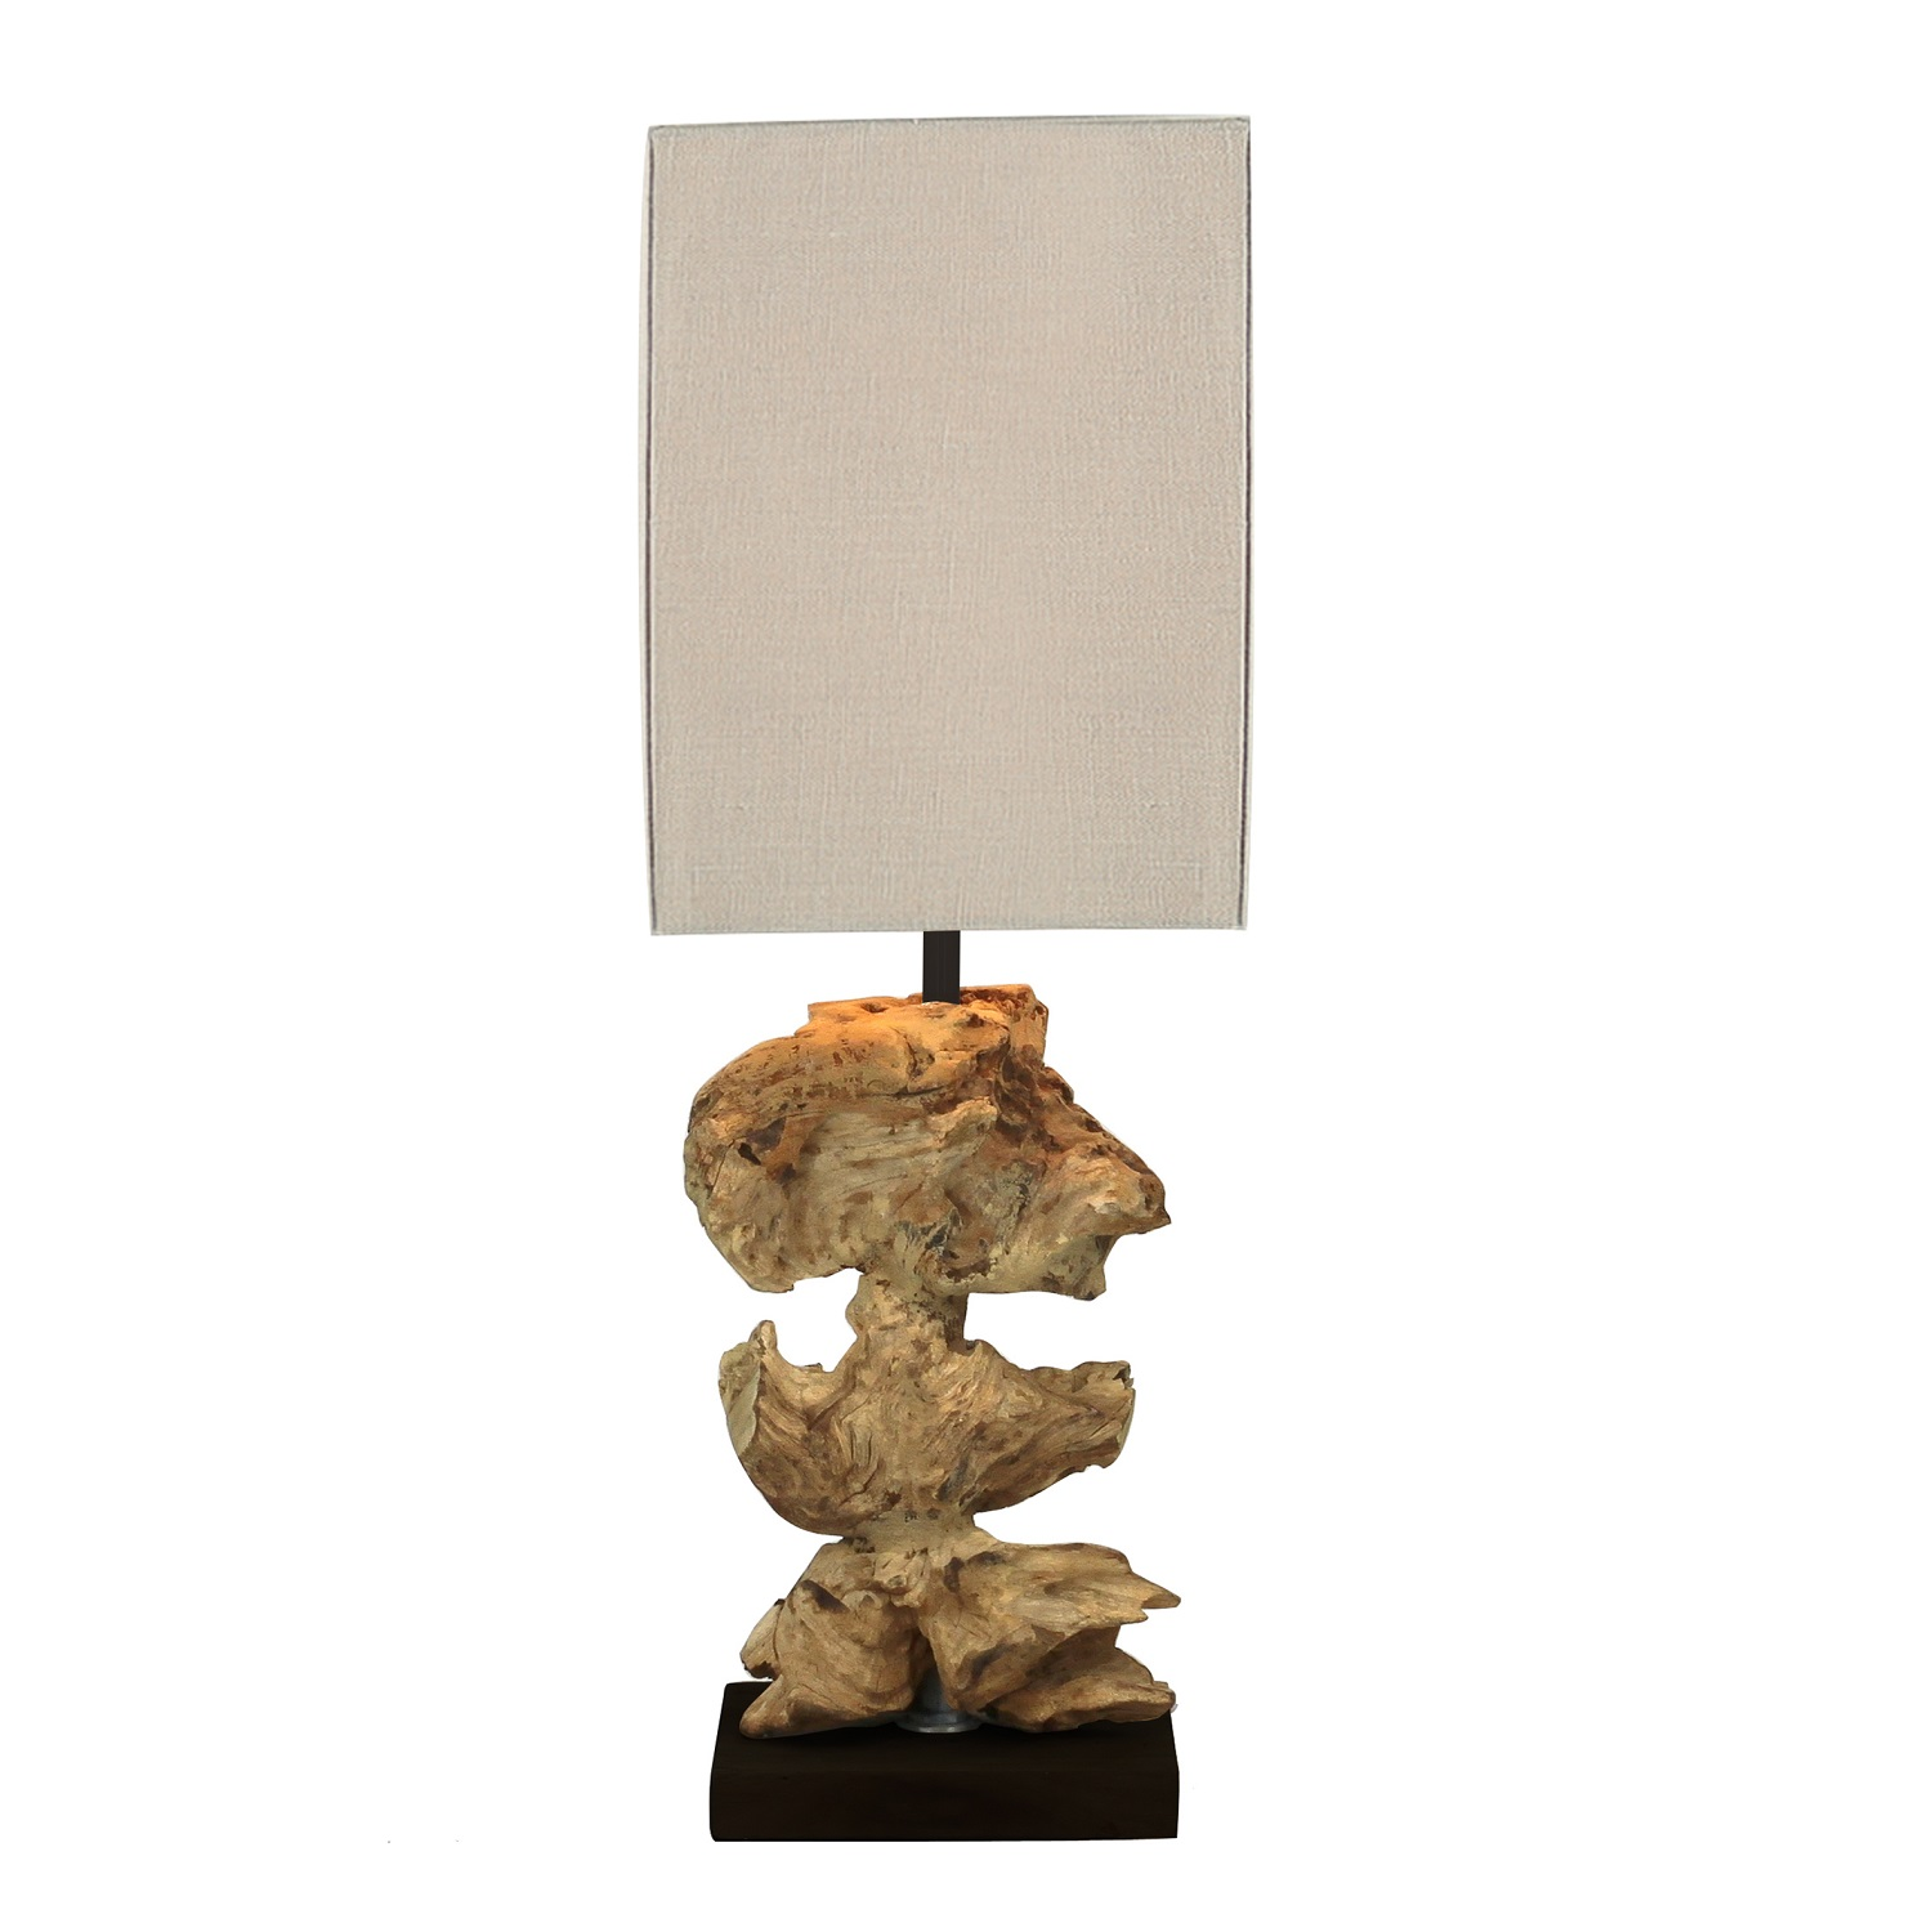 Lampe à poser en bois blanchi 15x15x45cm